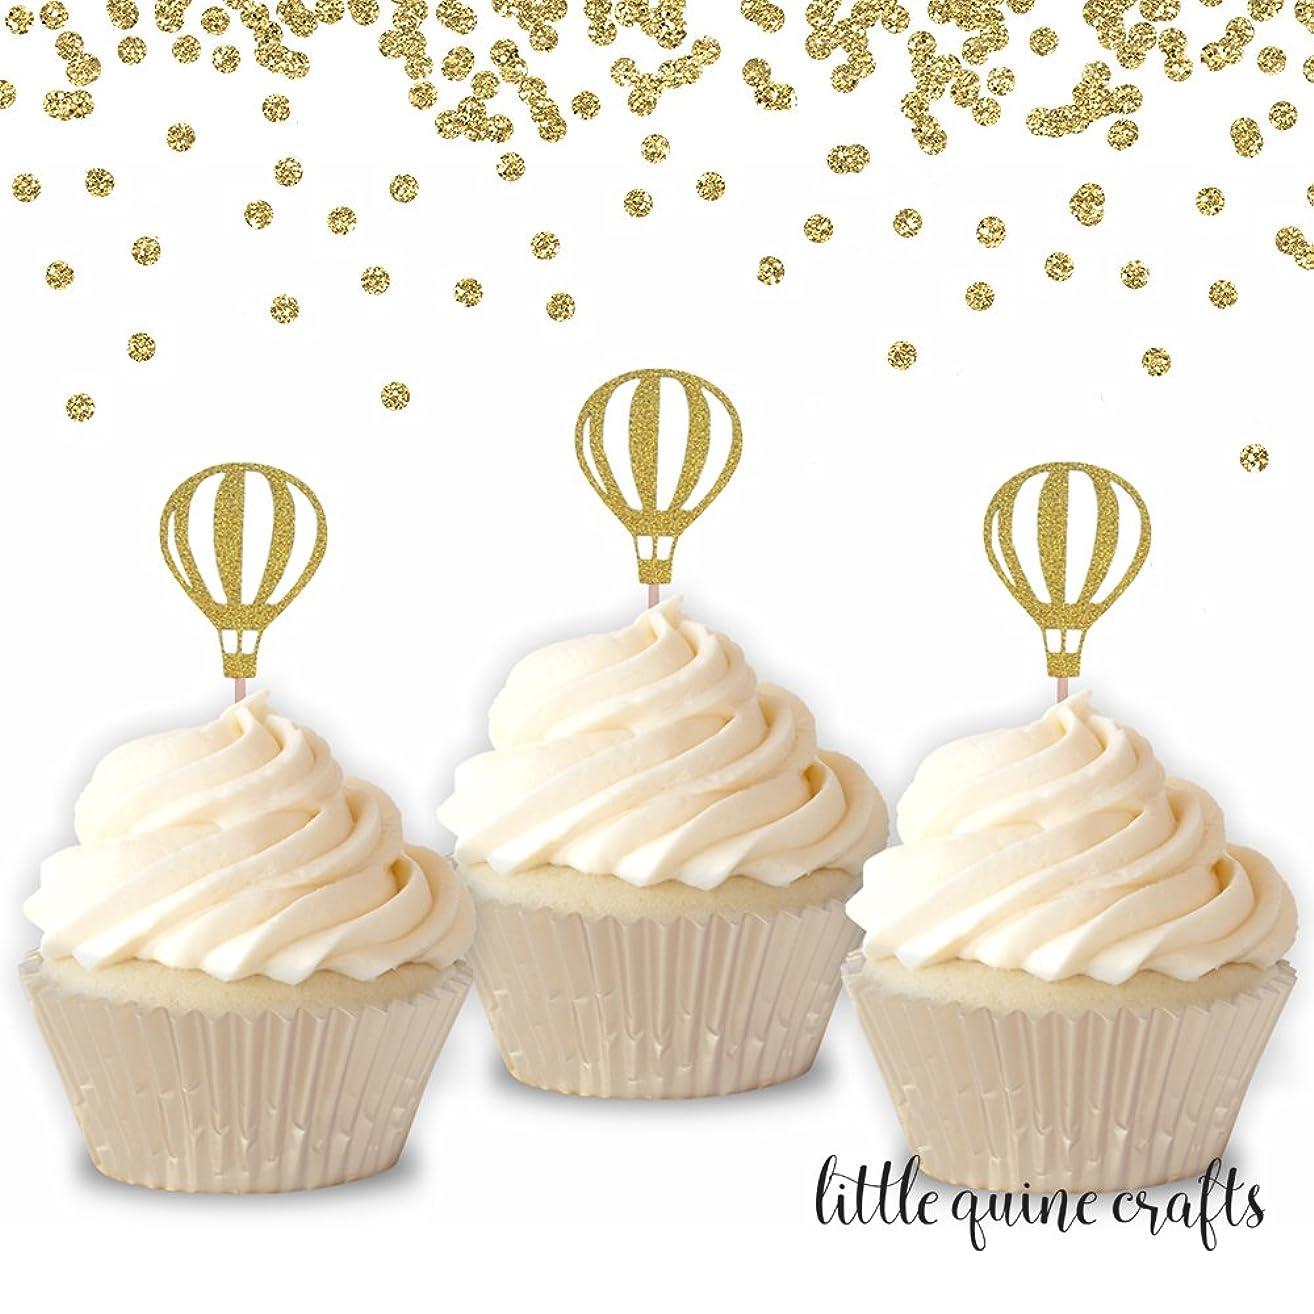 12 pcs Up Up & Away MINI cupcake topper Gold Glitter Hot Air Balloon Toddler boy girl Birthday Baby Shower Wedding Theme